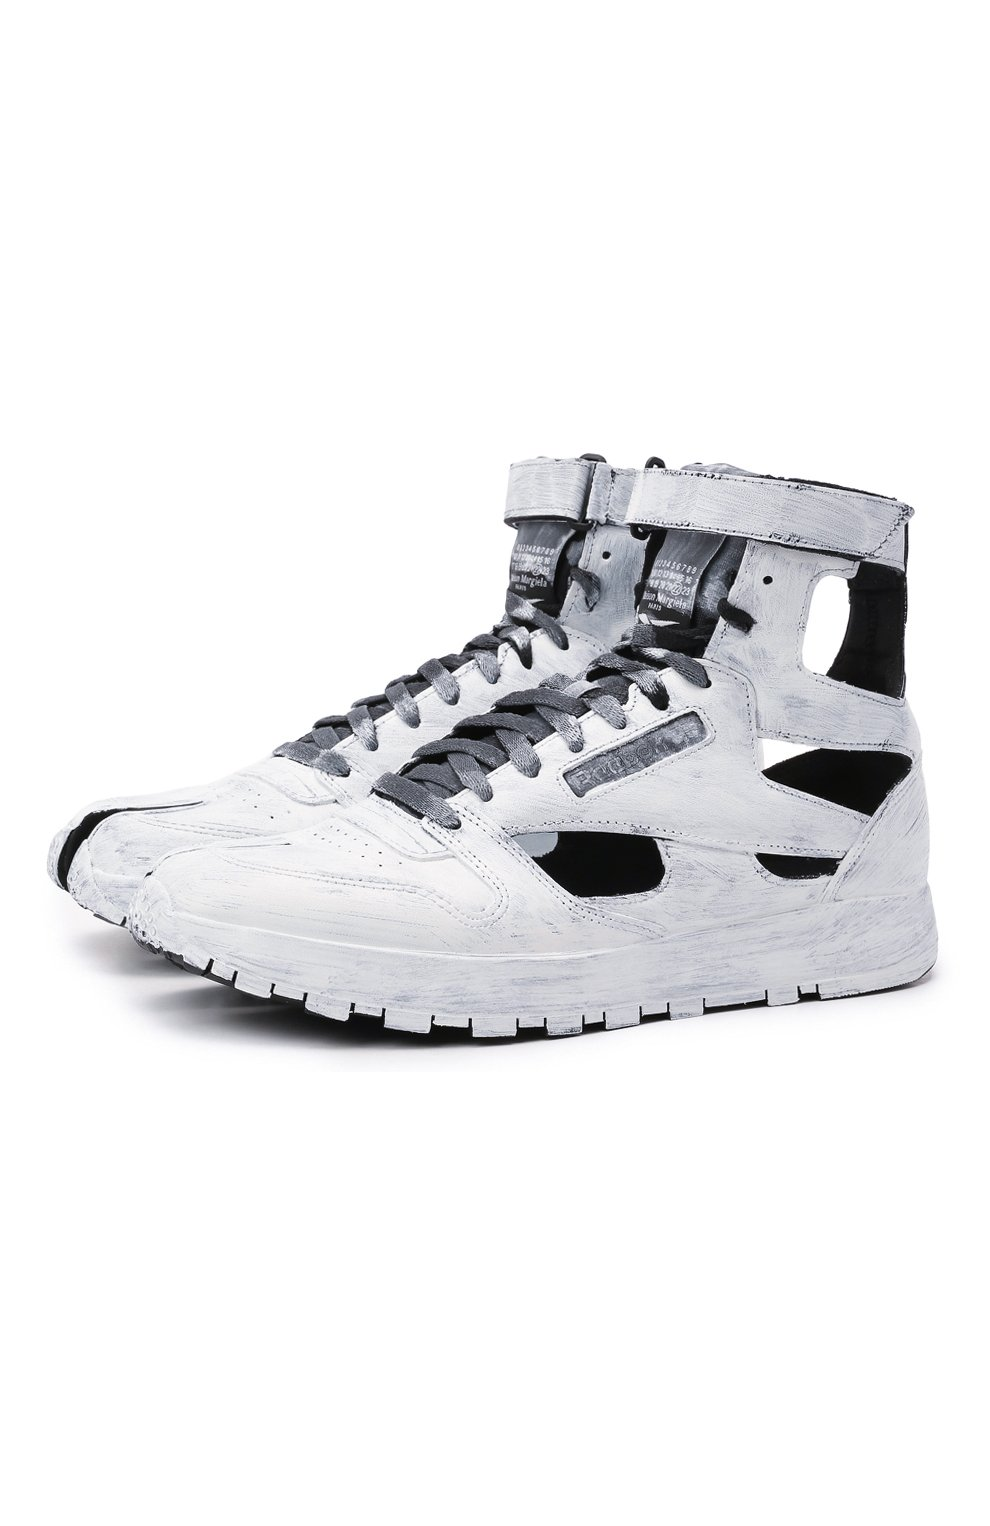 Мужские кроссовки tabi maison margiela x reebok classic MAISON MARGIELA белого цвета, арт. S37WS0569/P4242 | Фото 1 (Стили: Гранж; Материал внутренний: Текстиль; Подошва: Массивная)